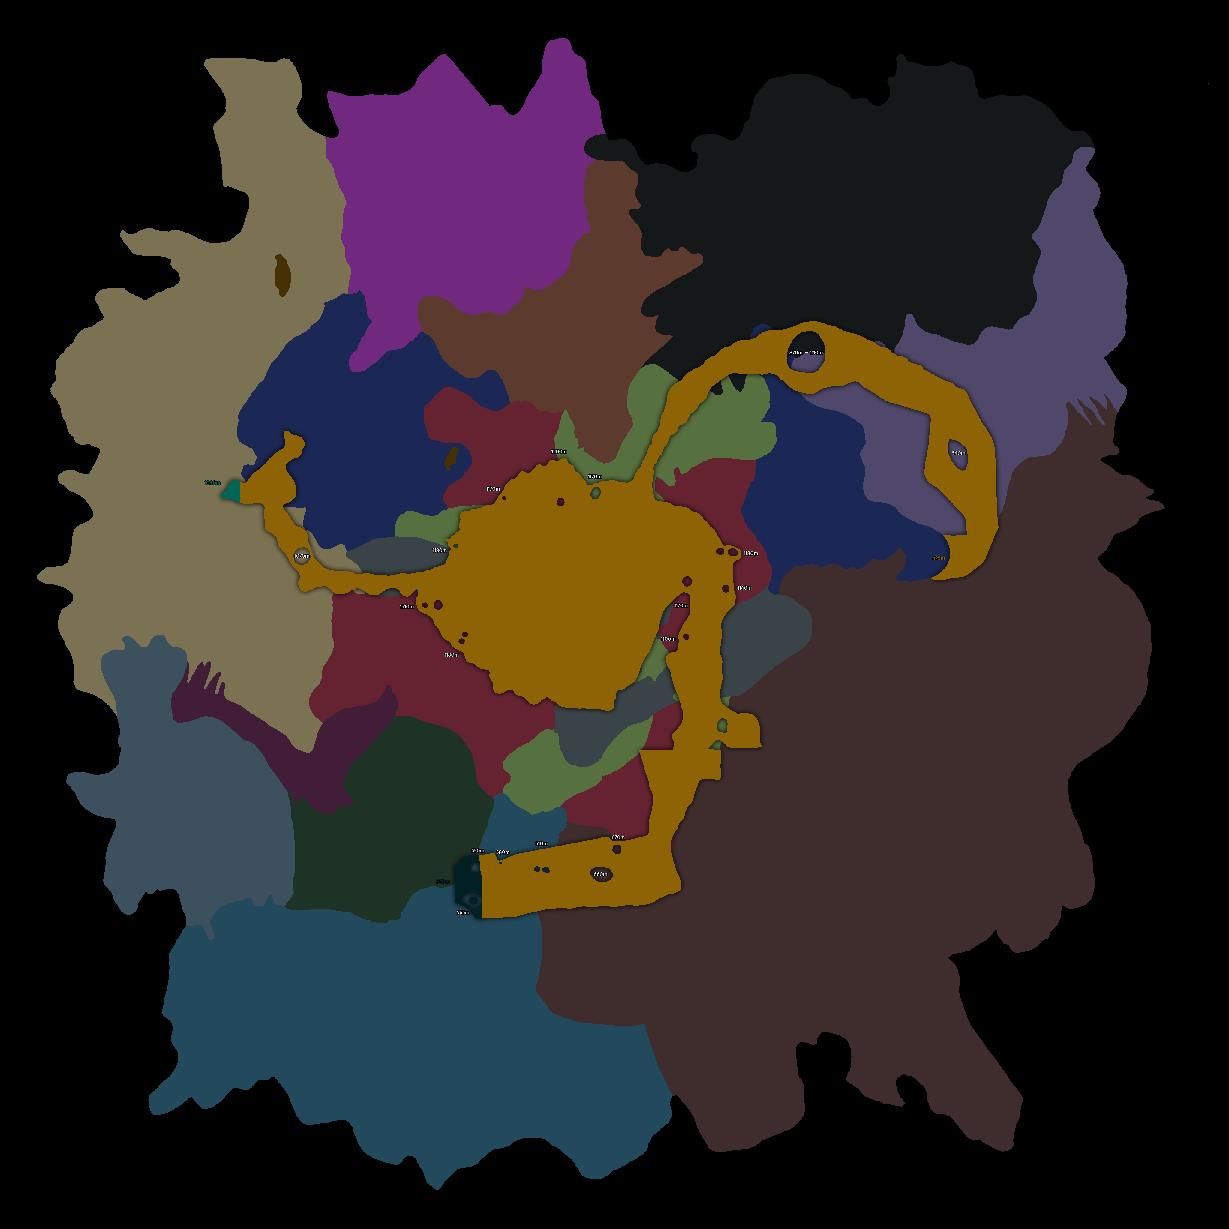 Mapping Subnautica | Subnautica Wiki | Fandom powered by Wikia